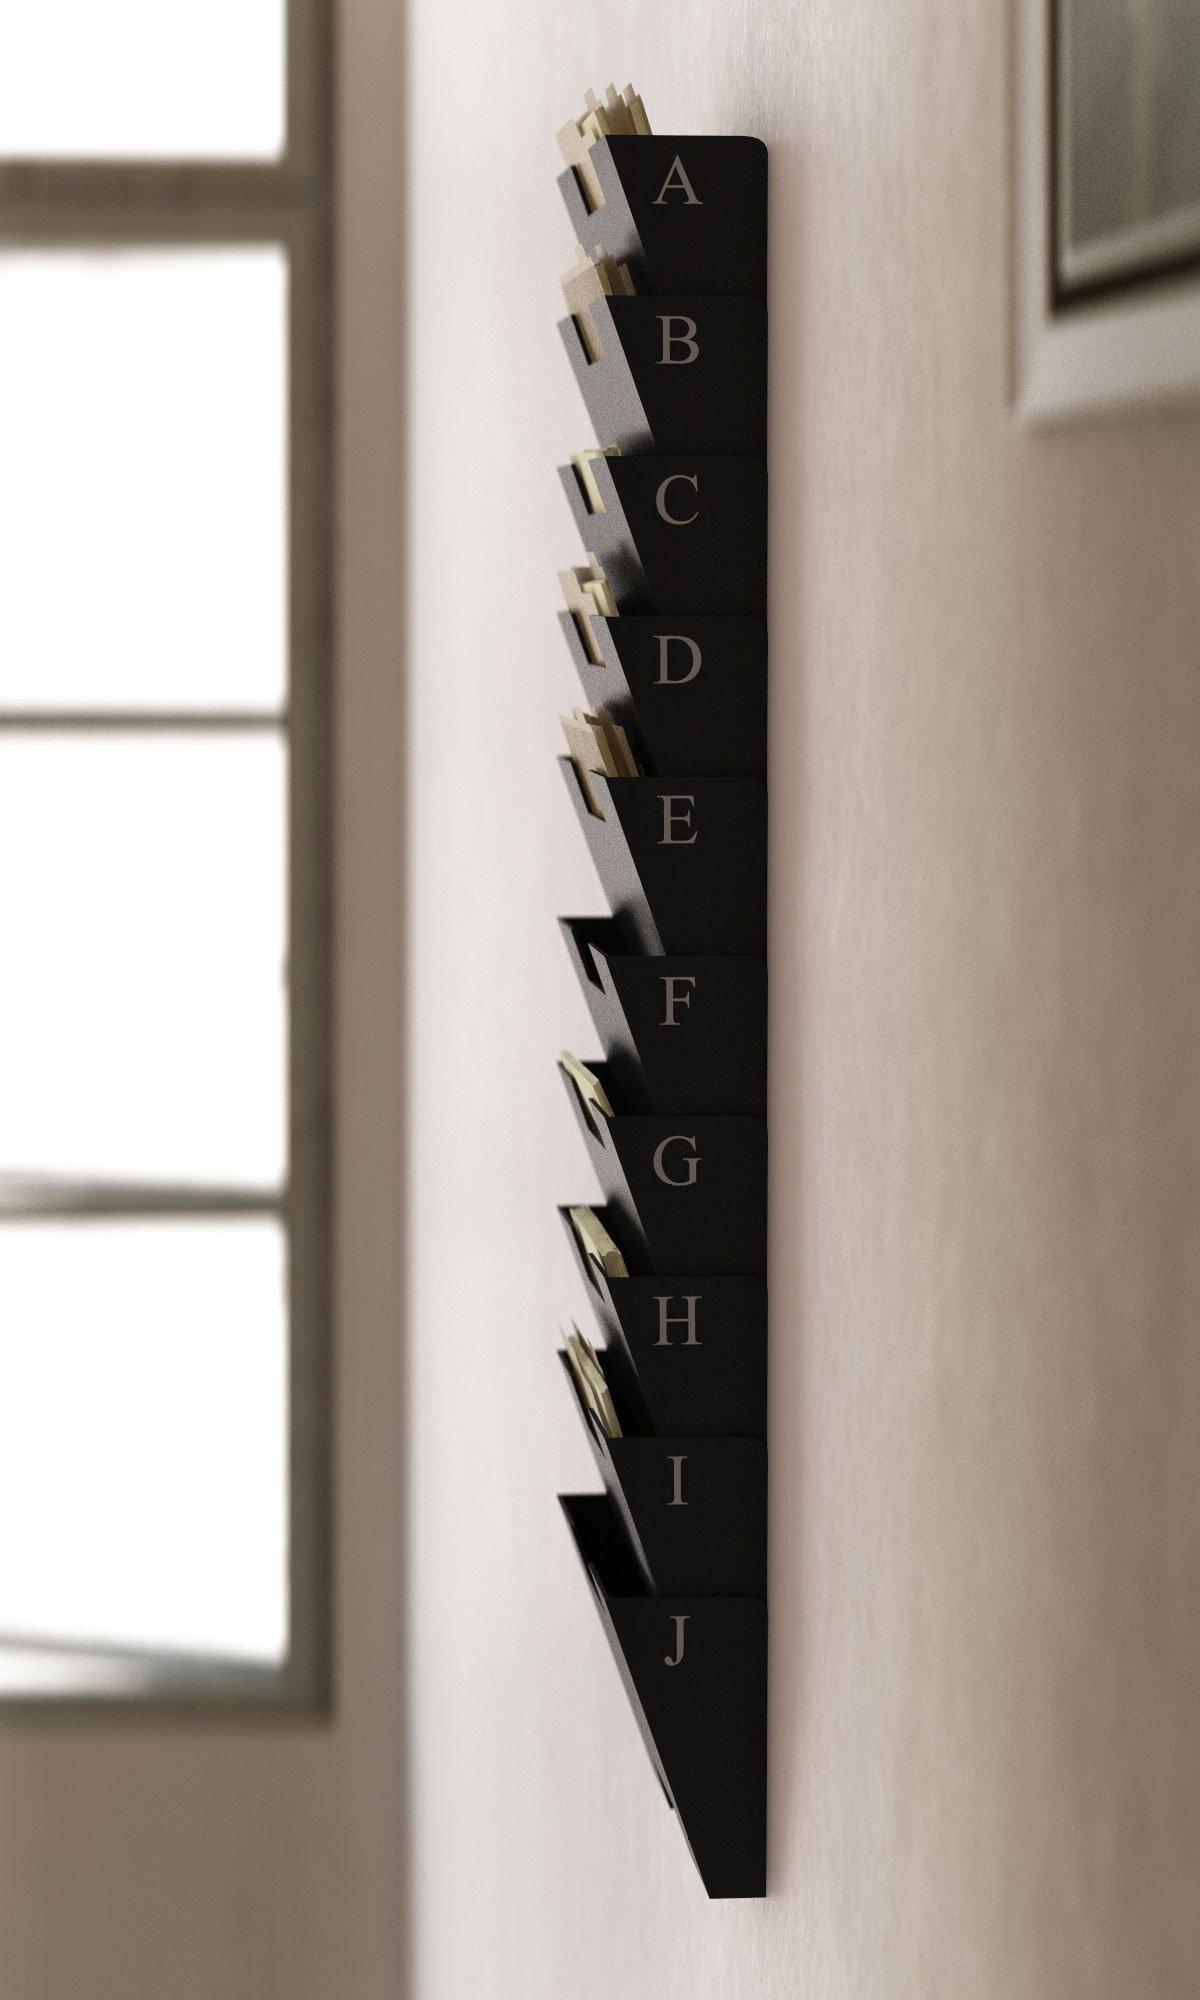 Black Wall Mount Steel File Holder Organizer Rack 10 Sectional Modular Design